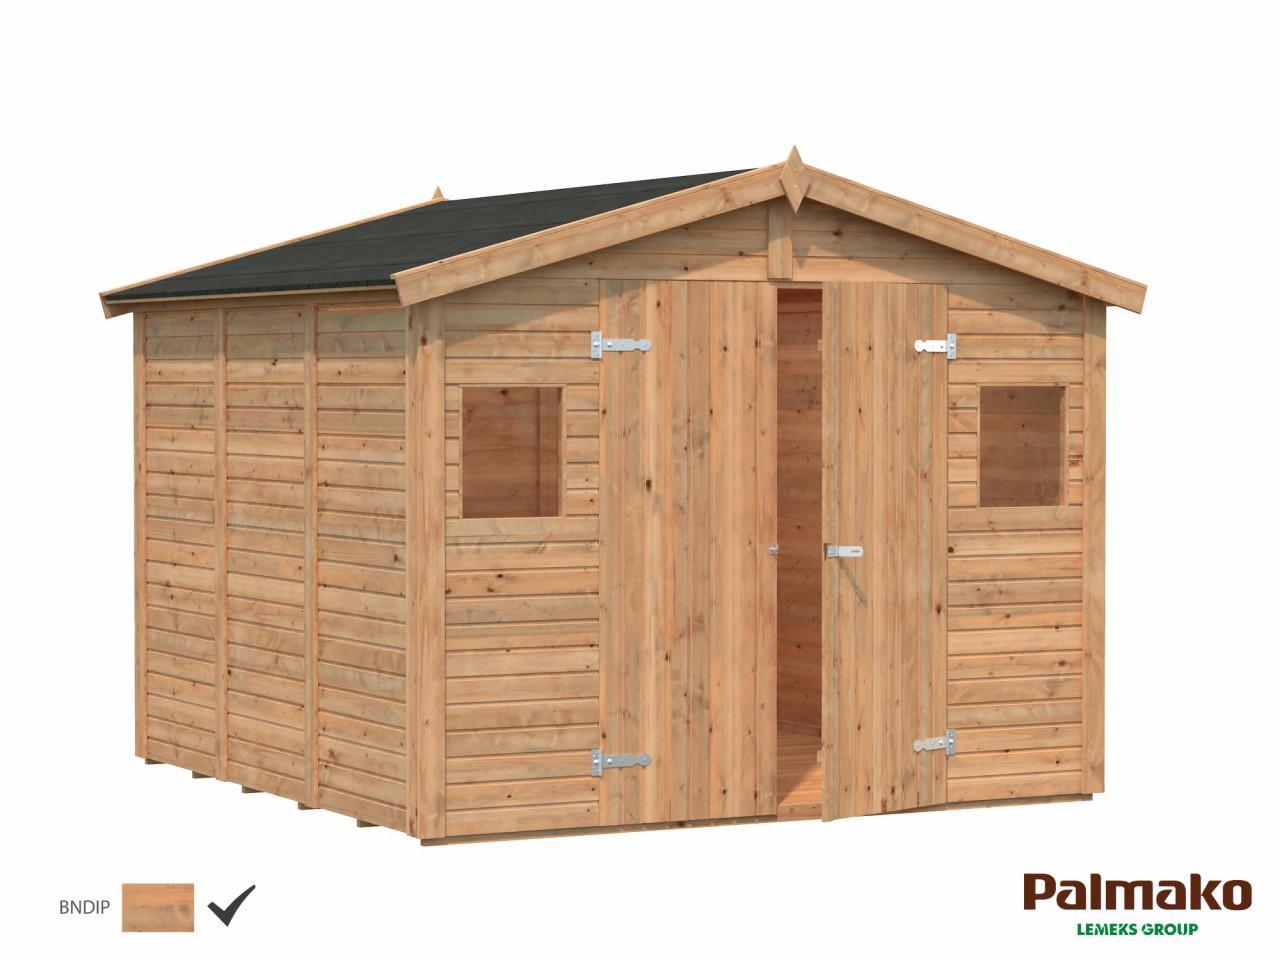 Palmako Gerätehaus Dan 7,5 m²